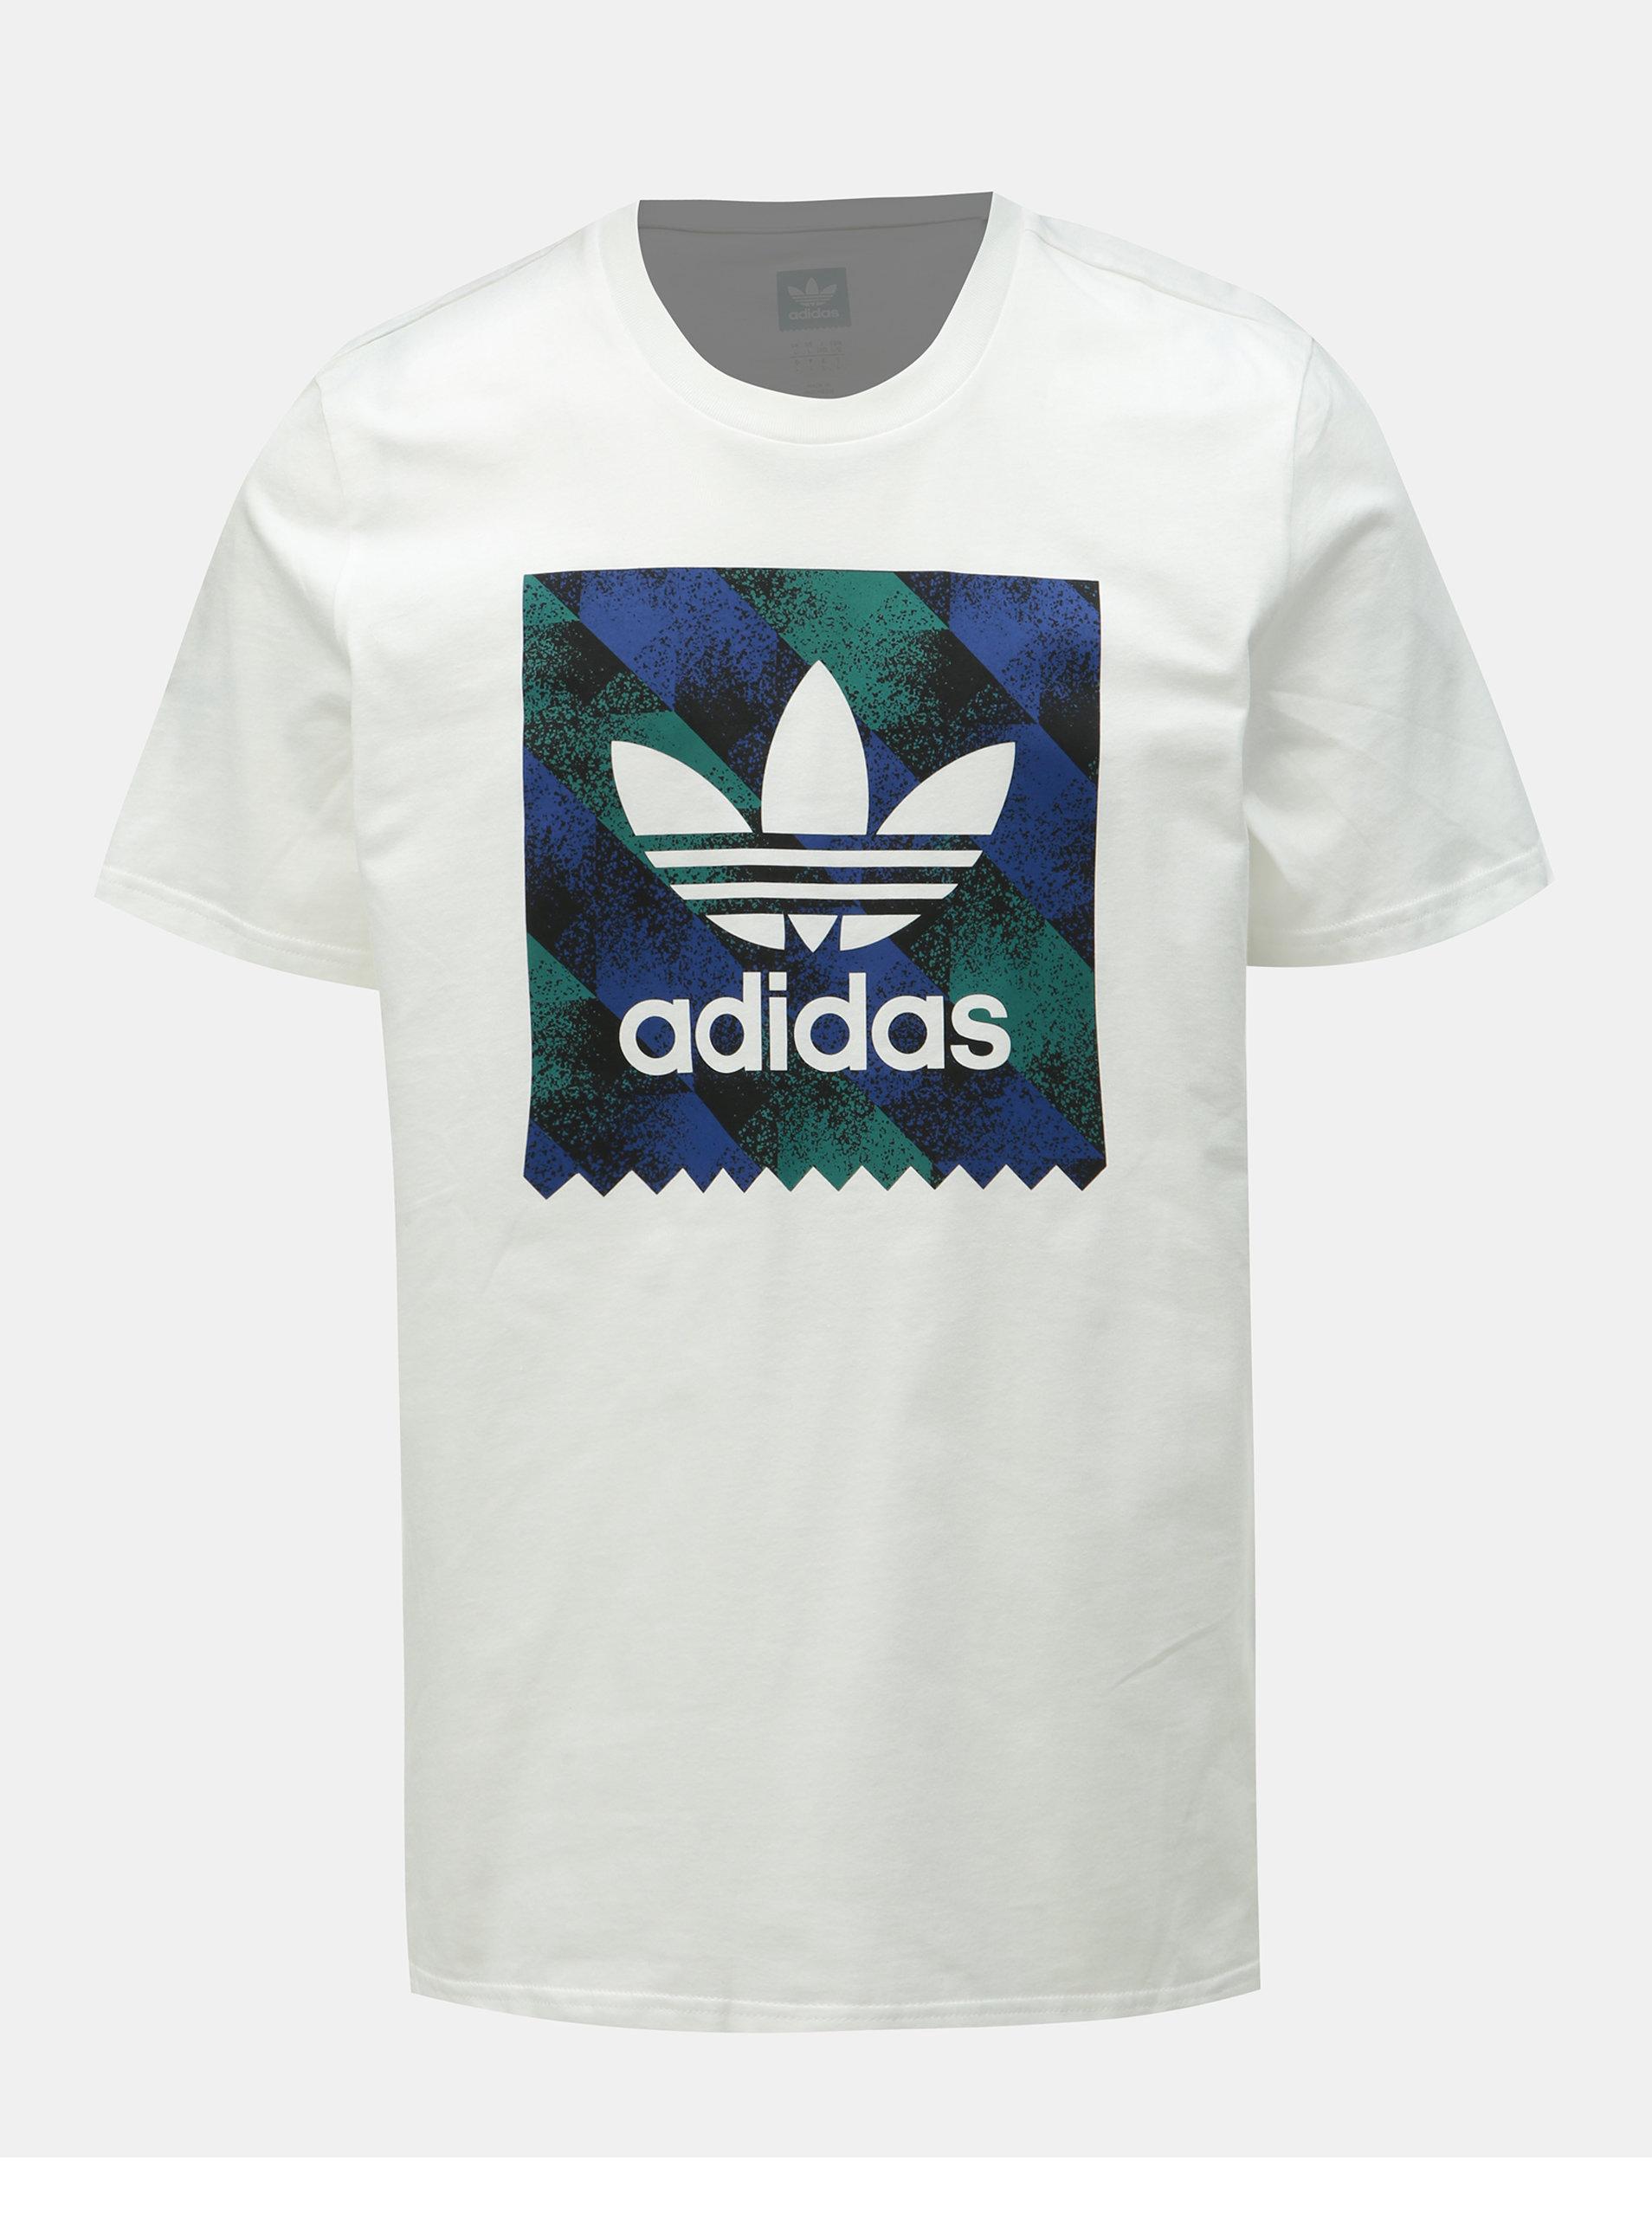 46829efb6b1a Biele pánske tričko s potlačou adidas Originals Towning ...